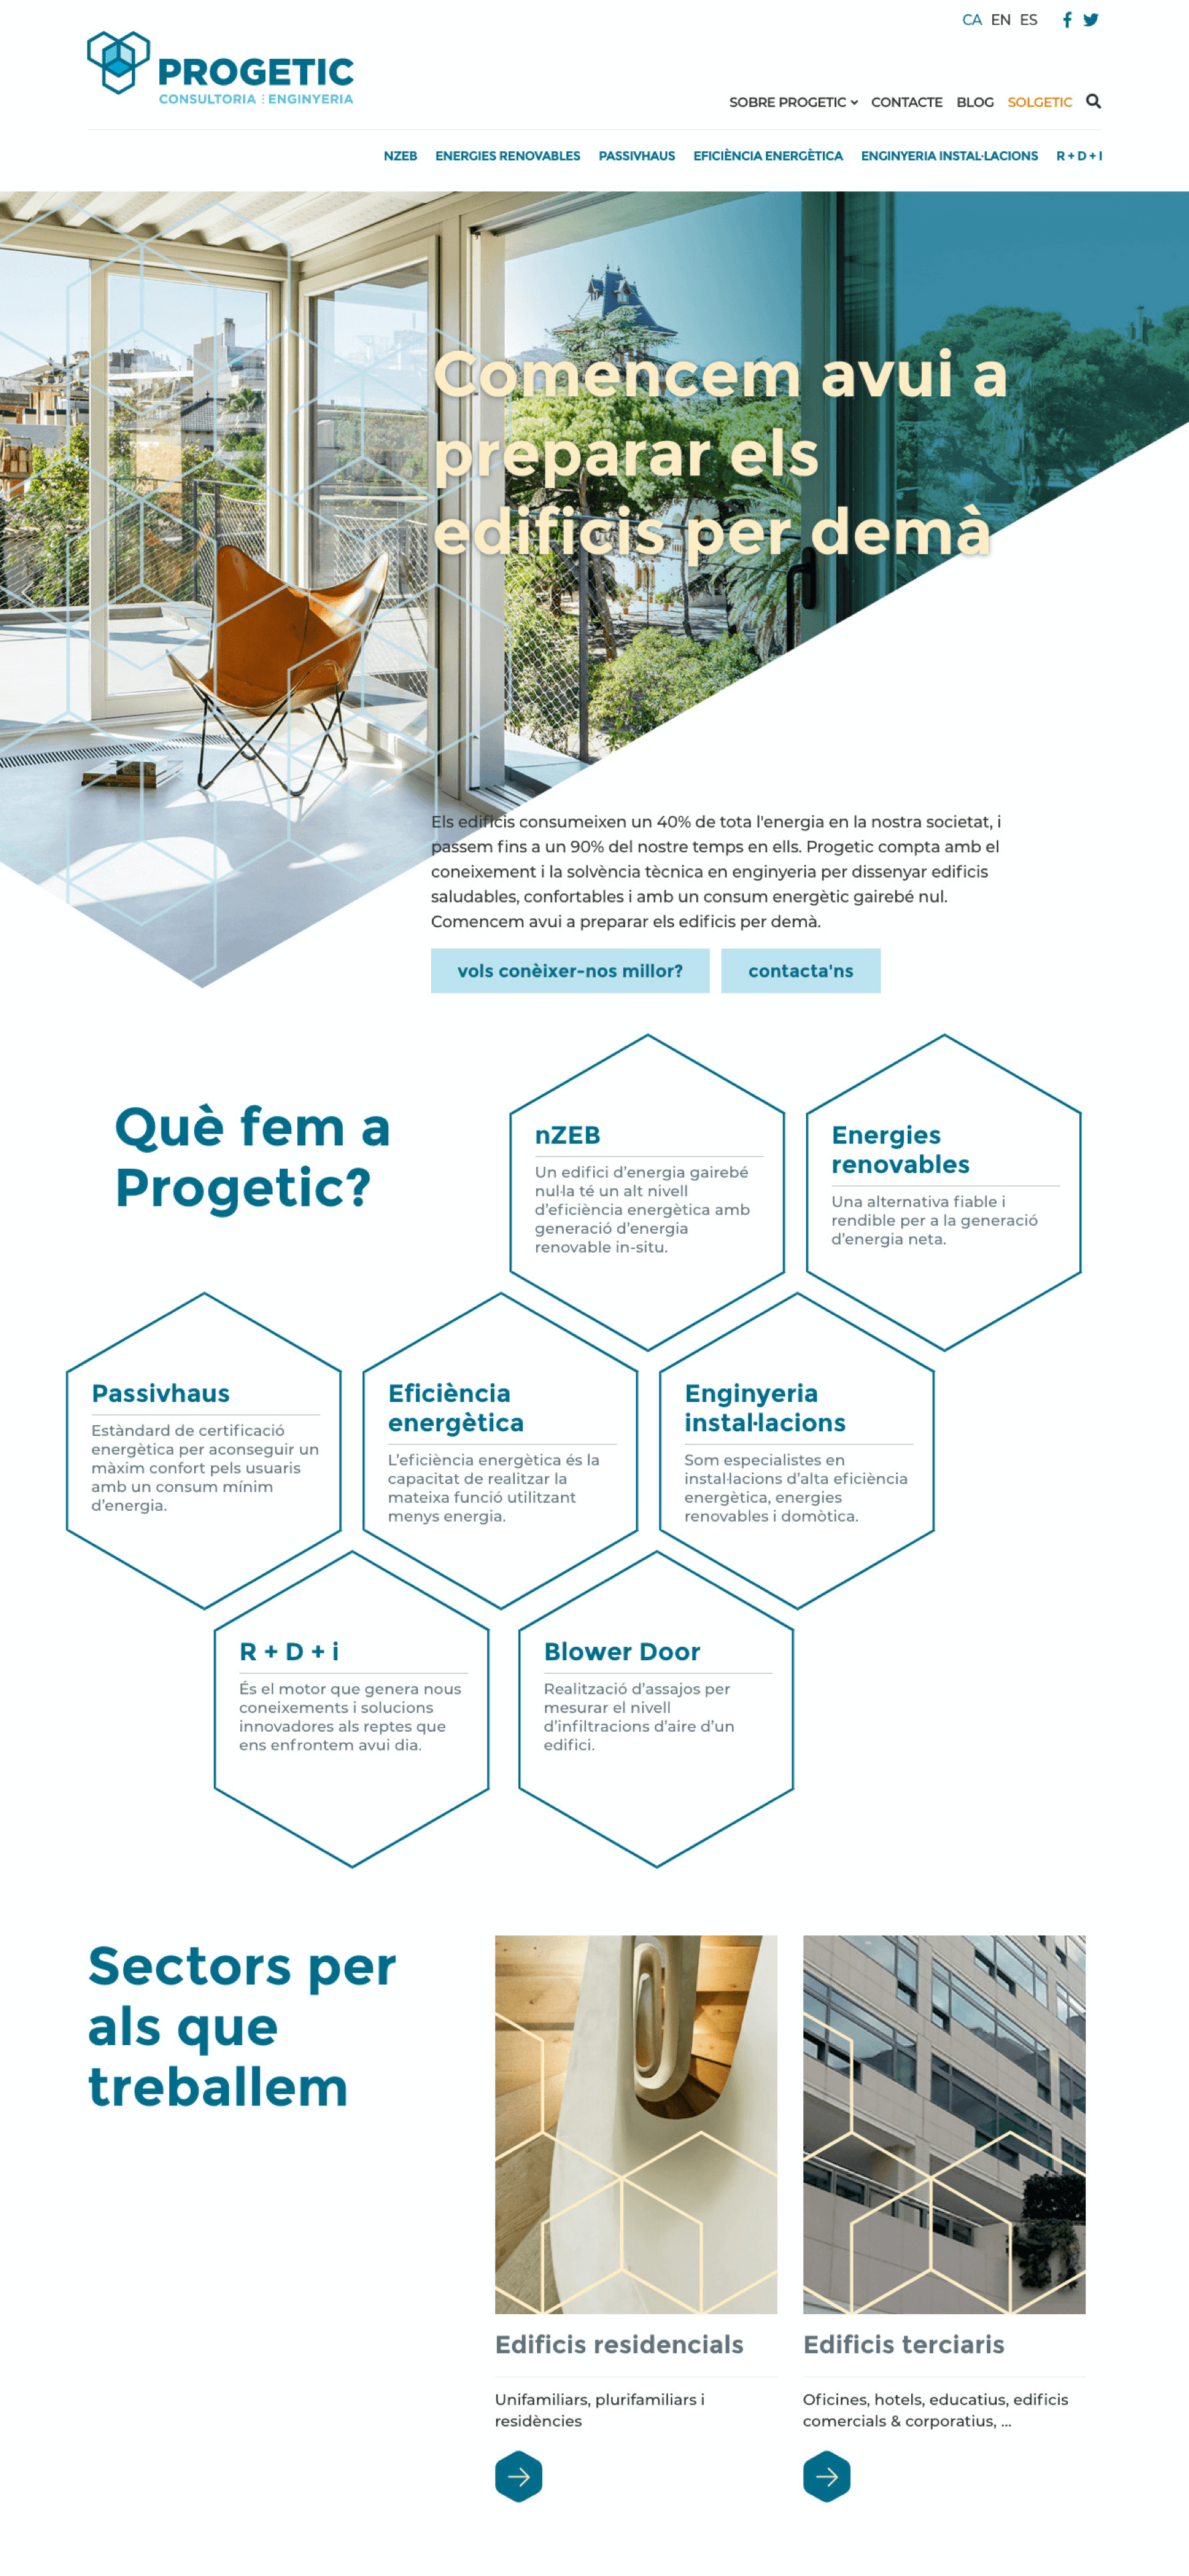 Web Progetic y Solgetic | Ideamatic